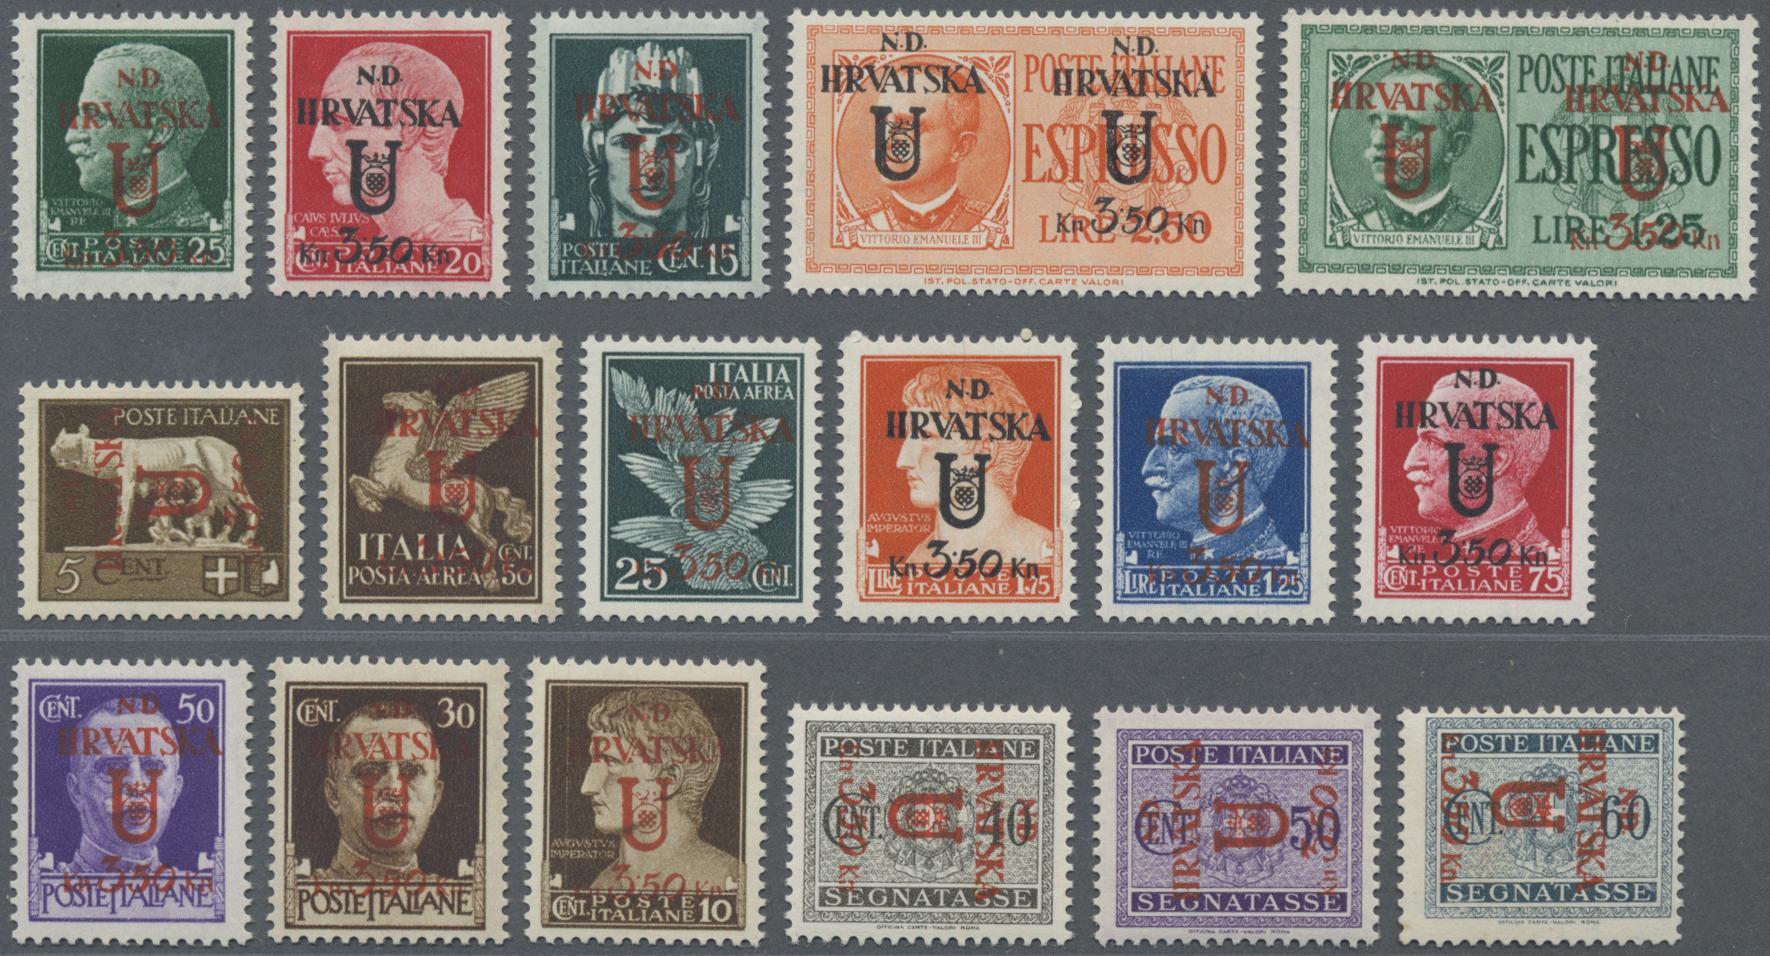 Lot 14325 - Kroatien - Lokalausgaben: Dalmatien  -  Auktionshaus Christoph Gärtner GmbH & Co. KG Sale #47 Single lots: Asia, Thematics, Overseas, Europe